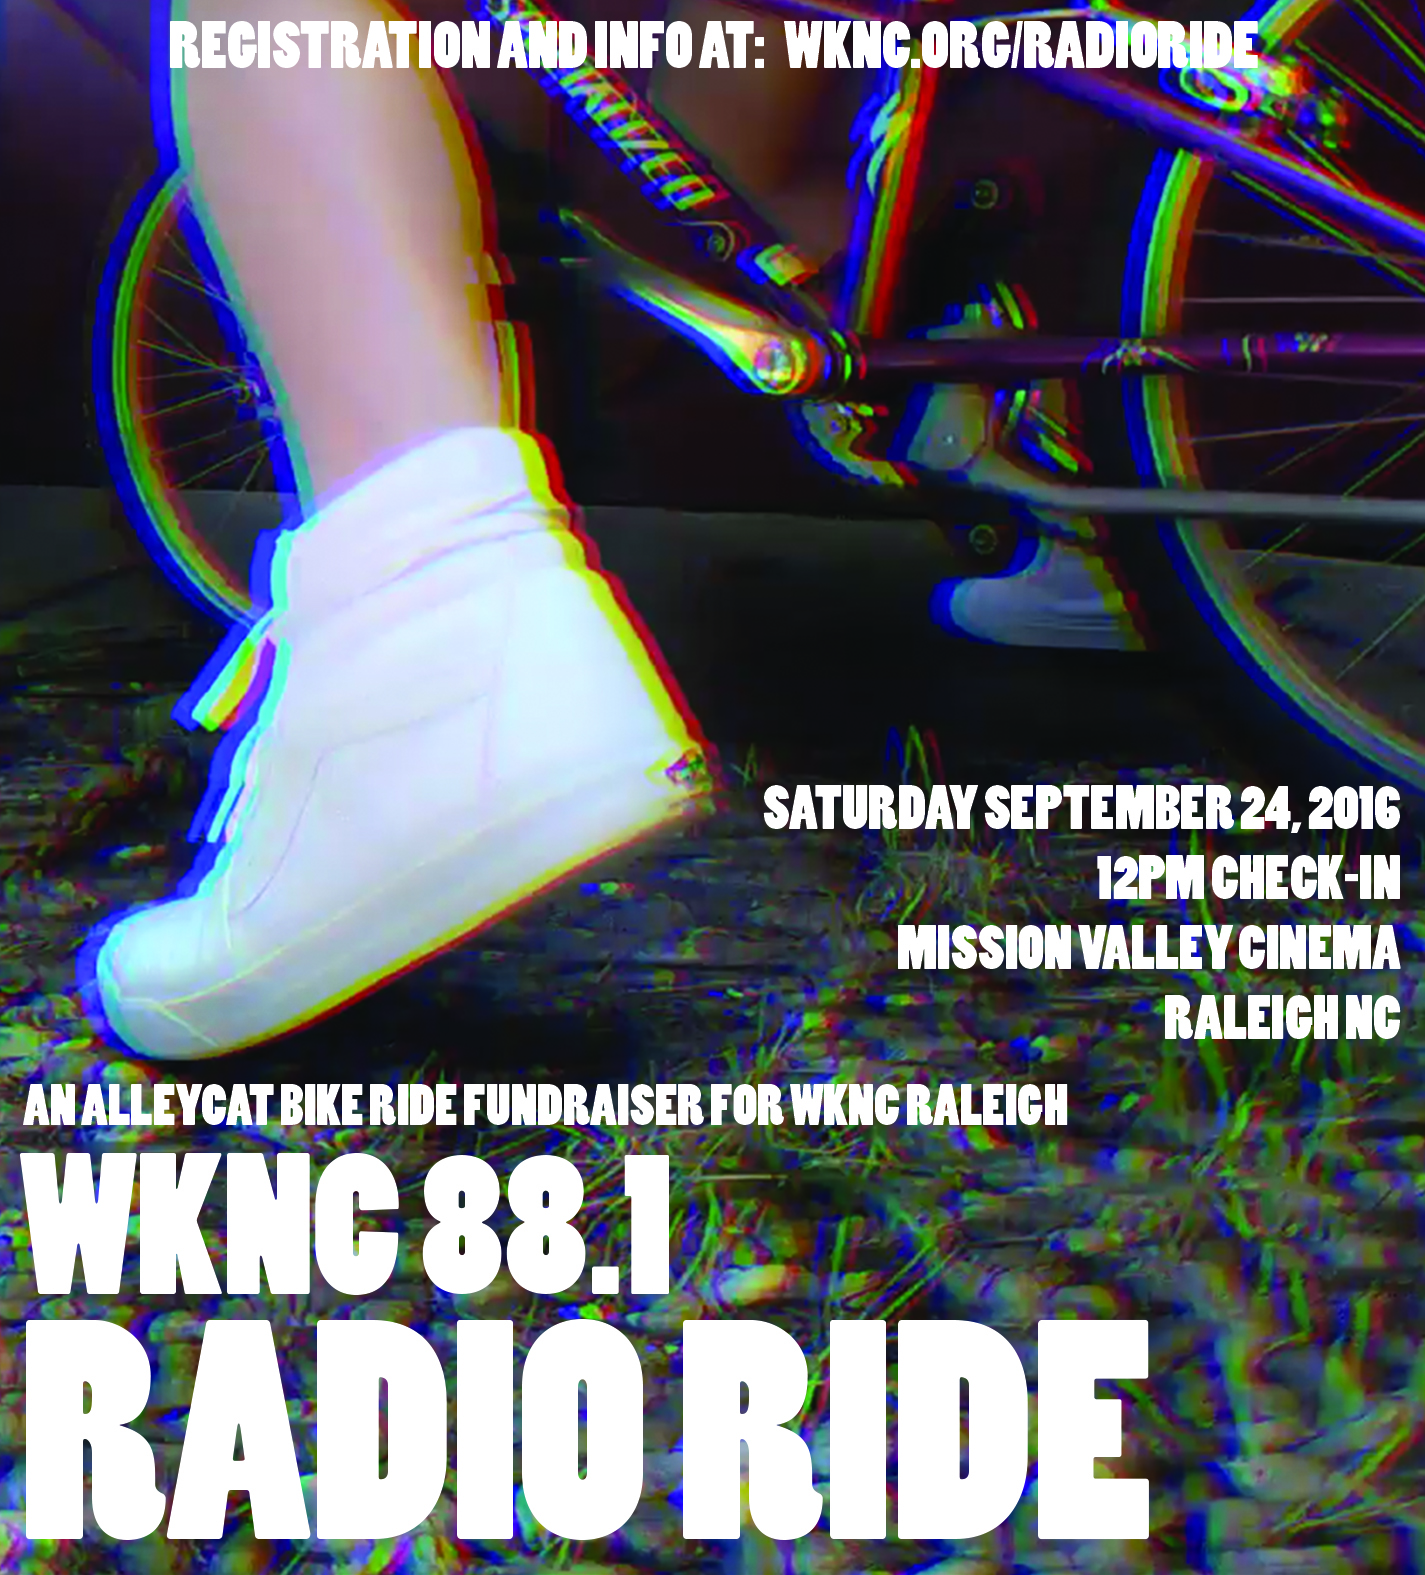 WKNC Radio Ride